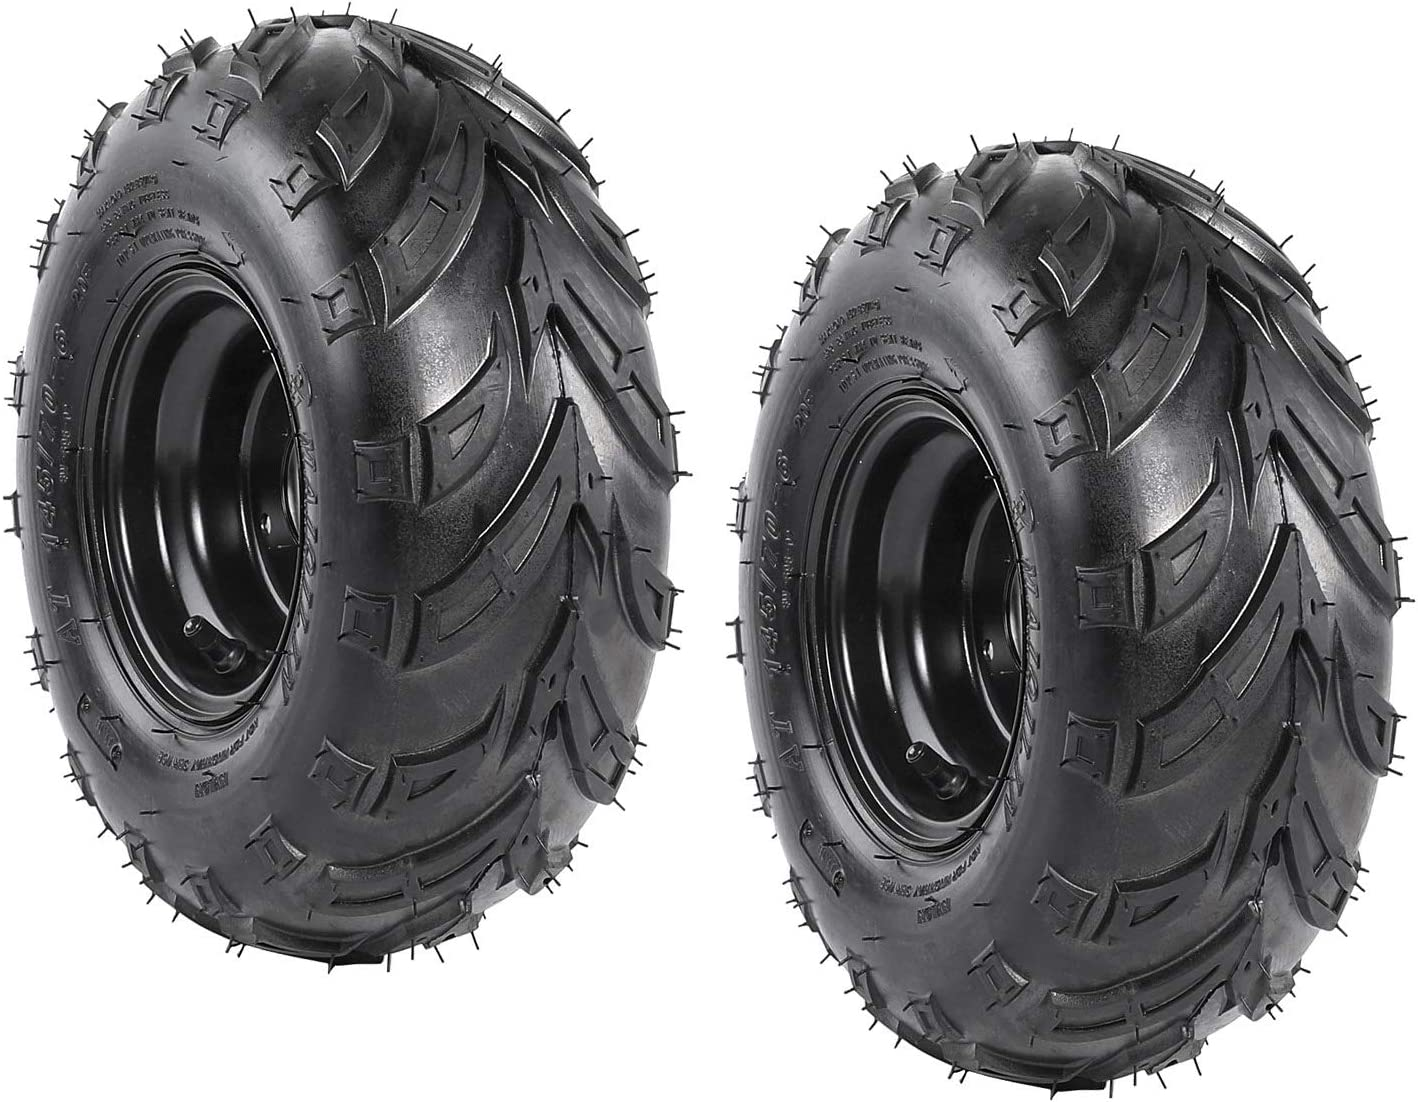 Amazon Com Wphmoto 2 Packs Of 145 70 6 Atv Tires With Rims Wheels For Quad 4 Wheelers Go Kart Mini Bike Lawn Automotive